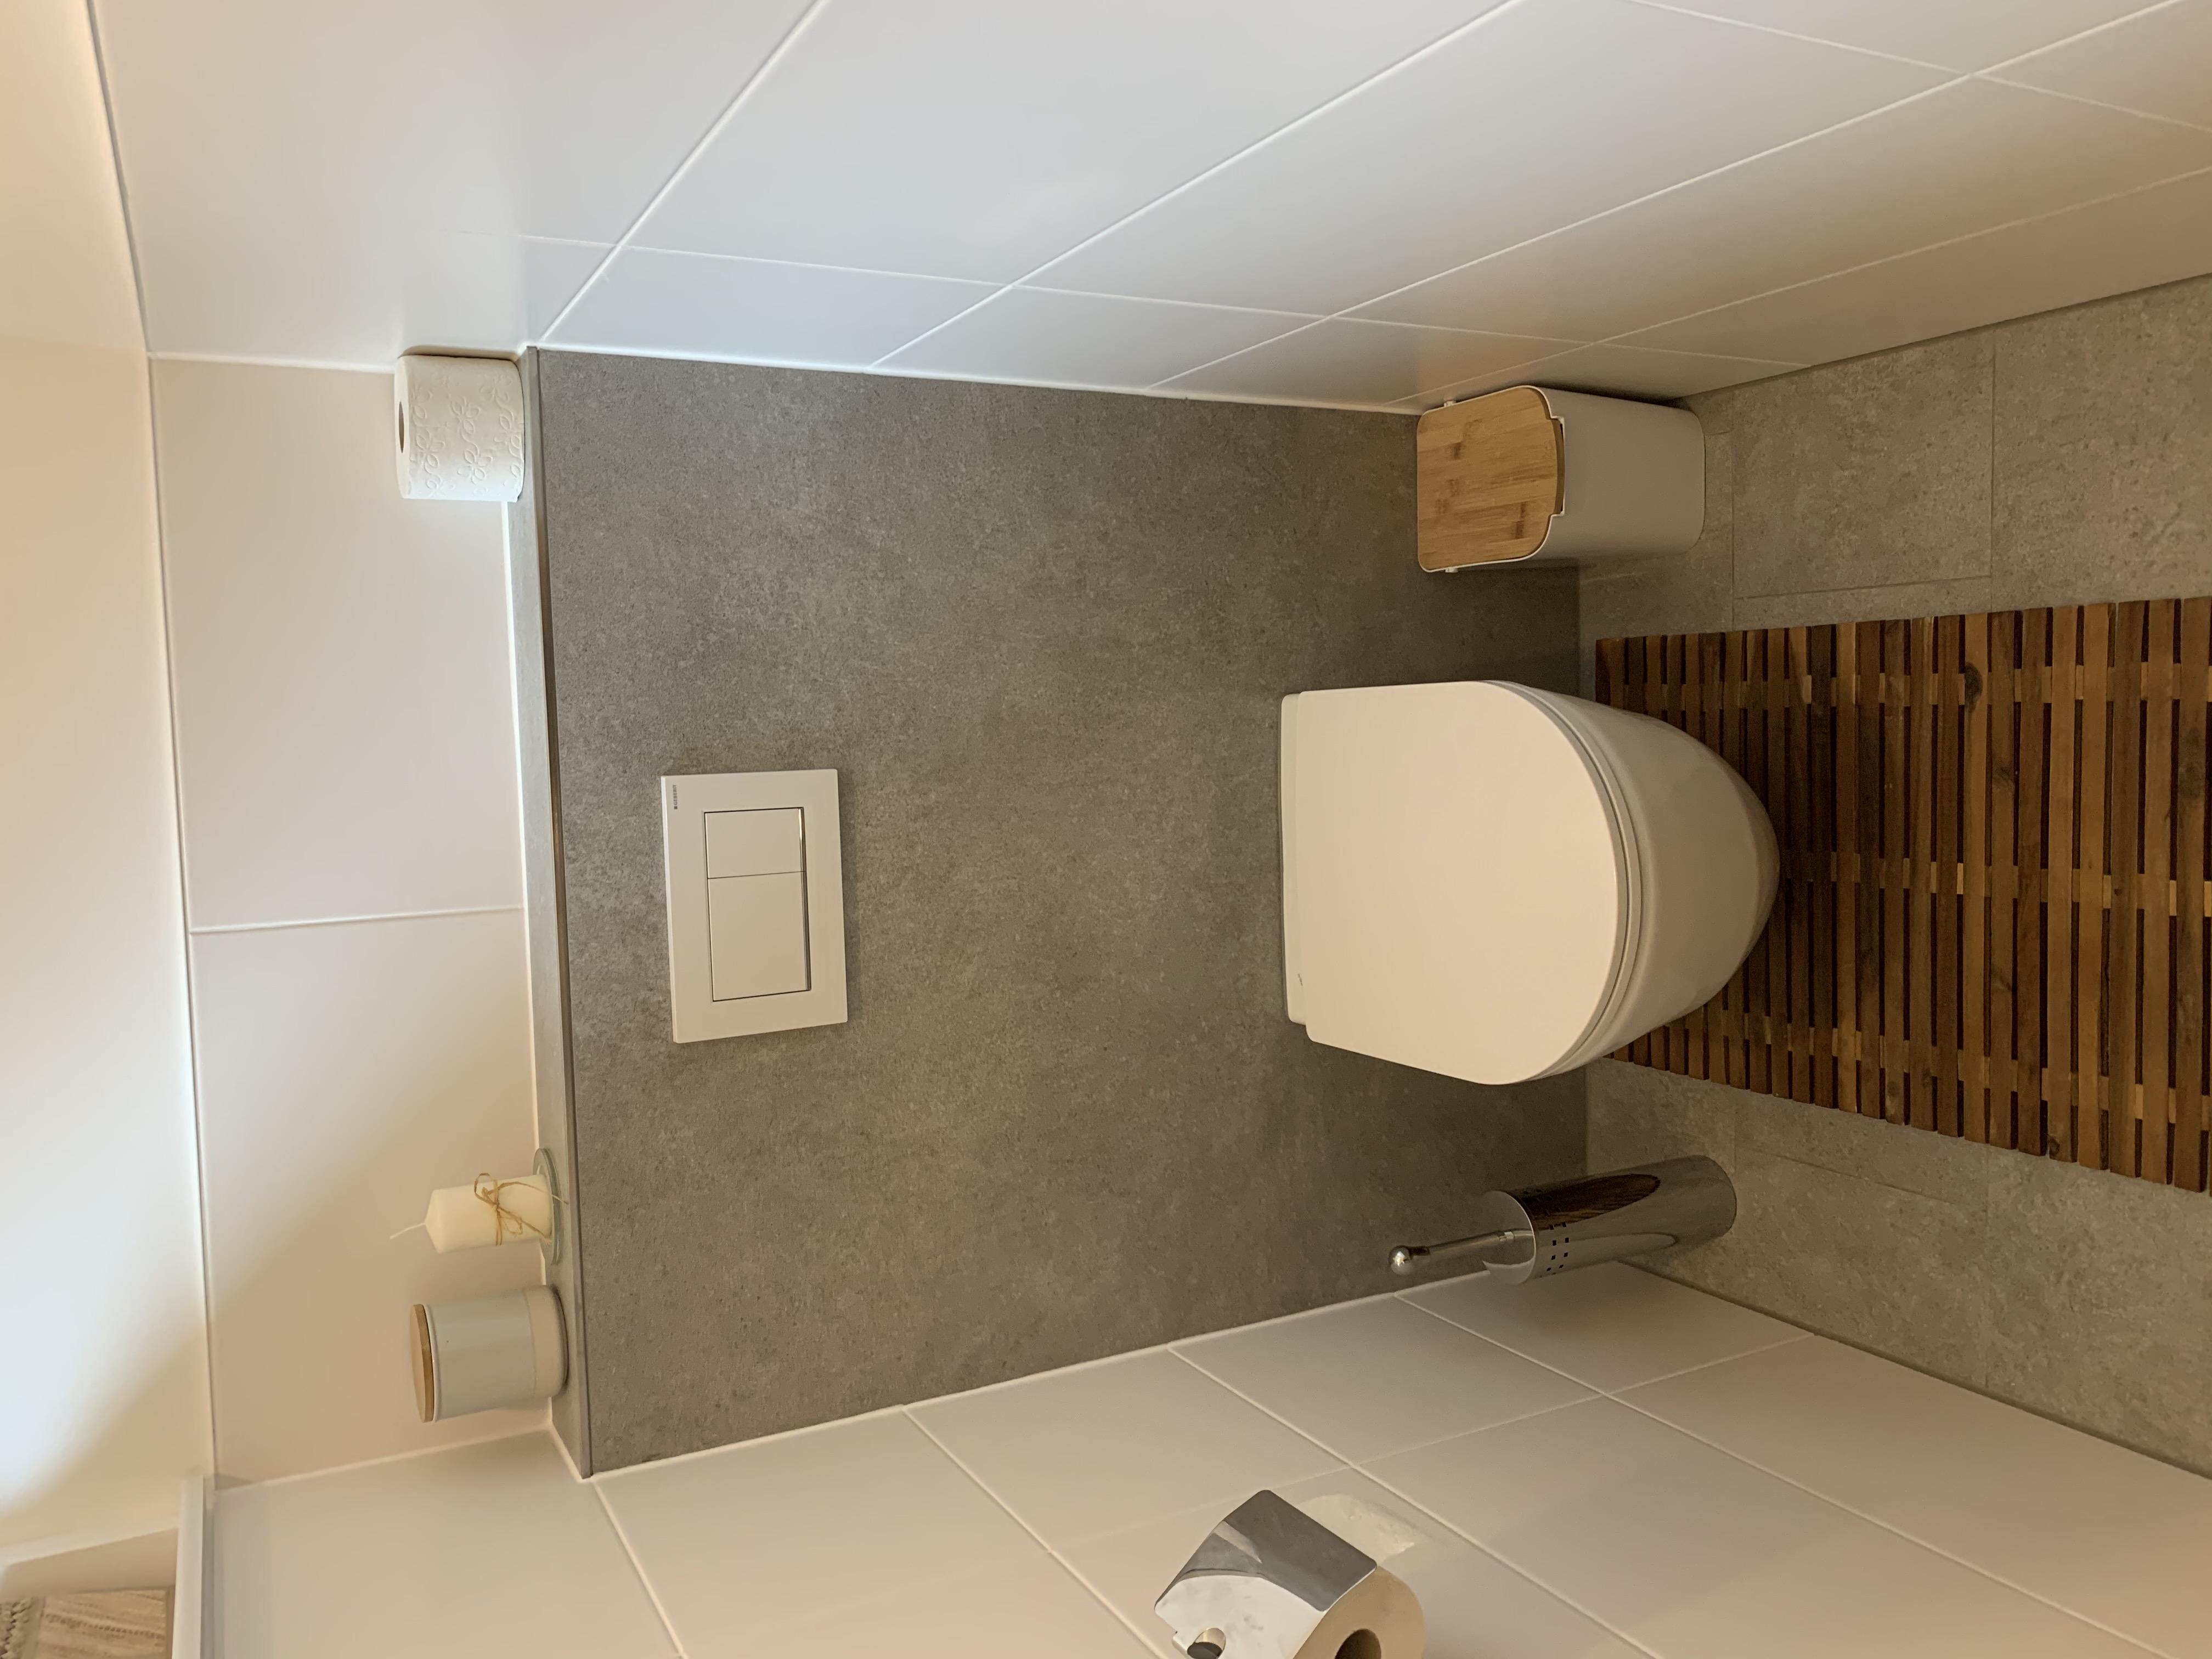 Foto Beispiel WC-Verfliesung 7